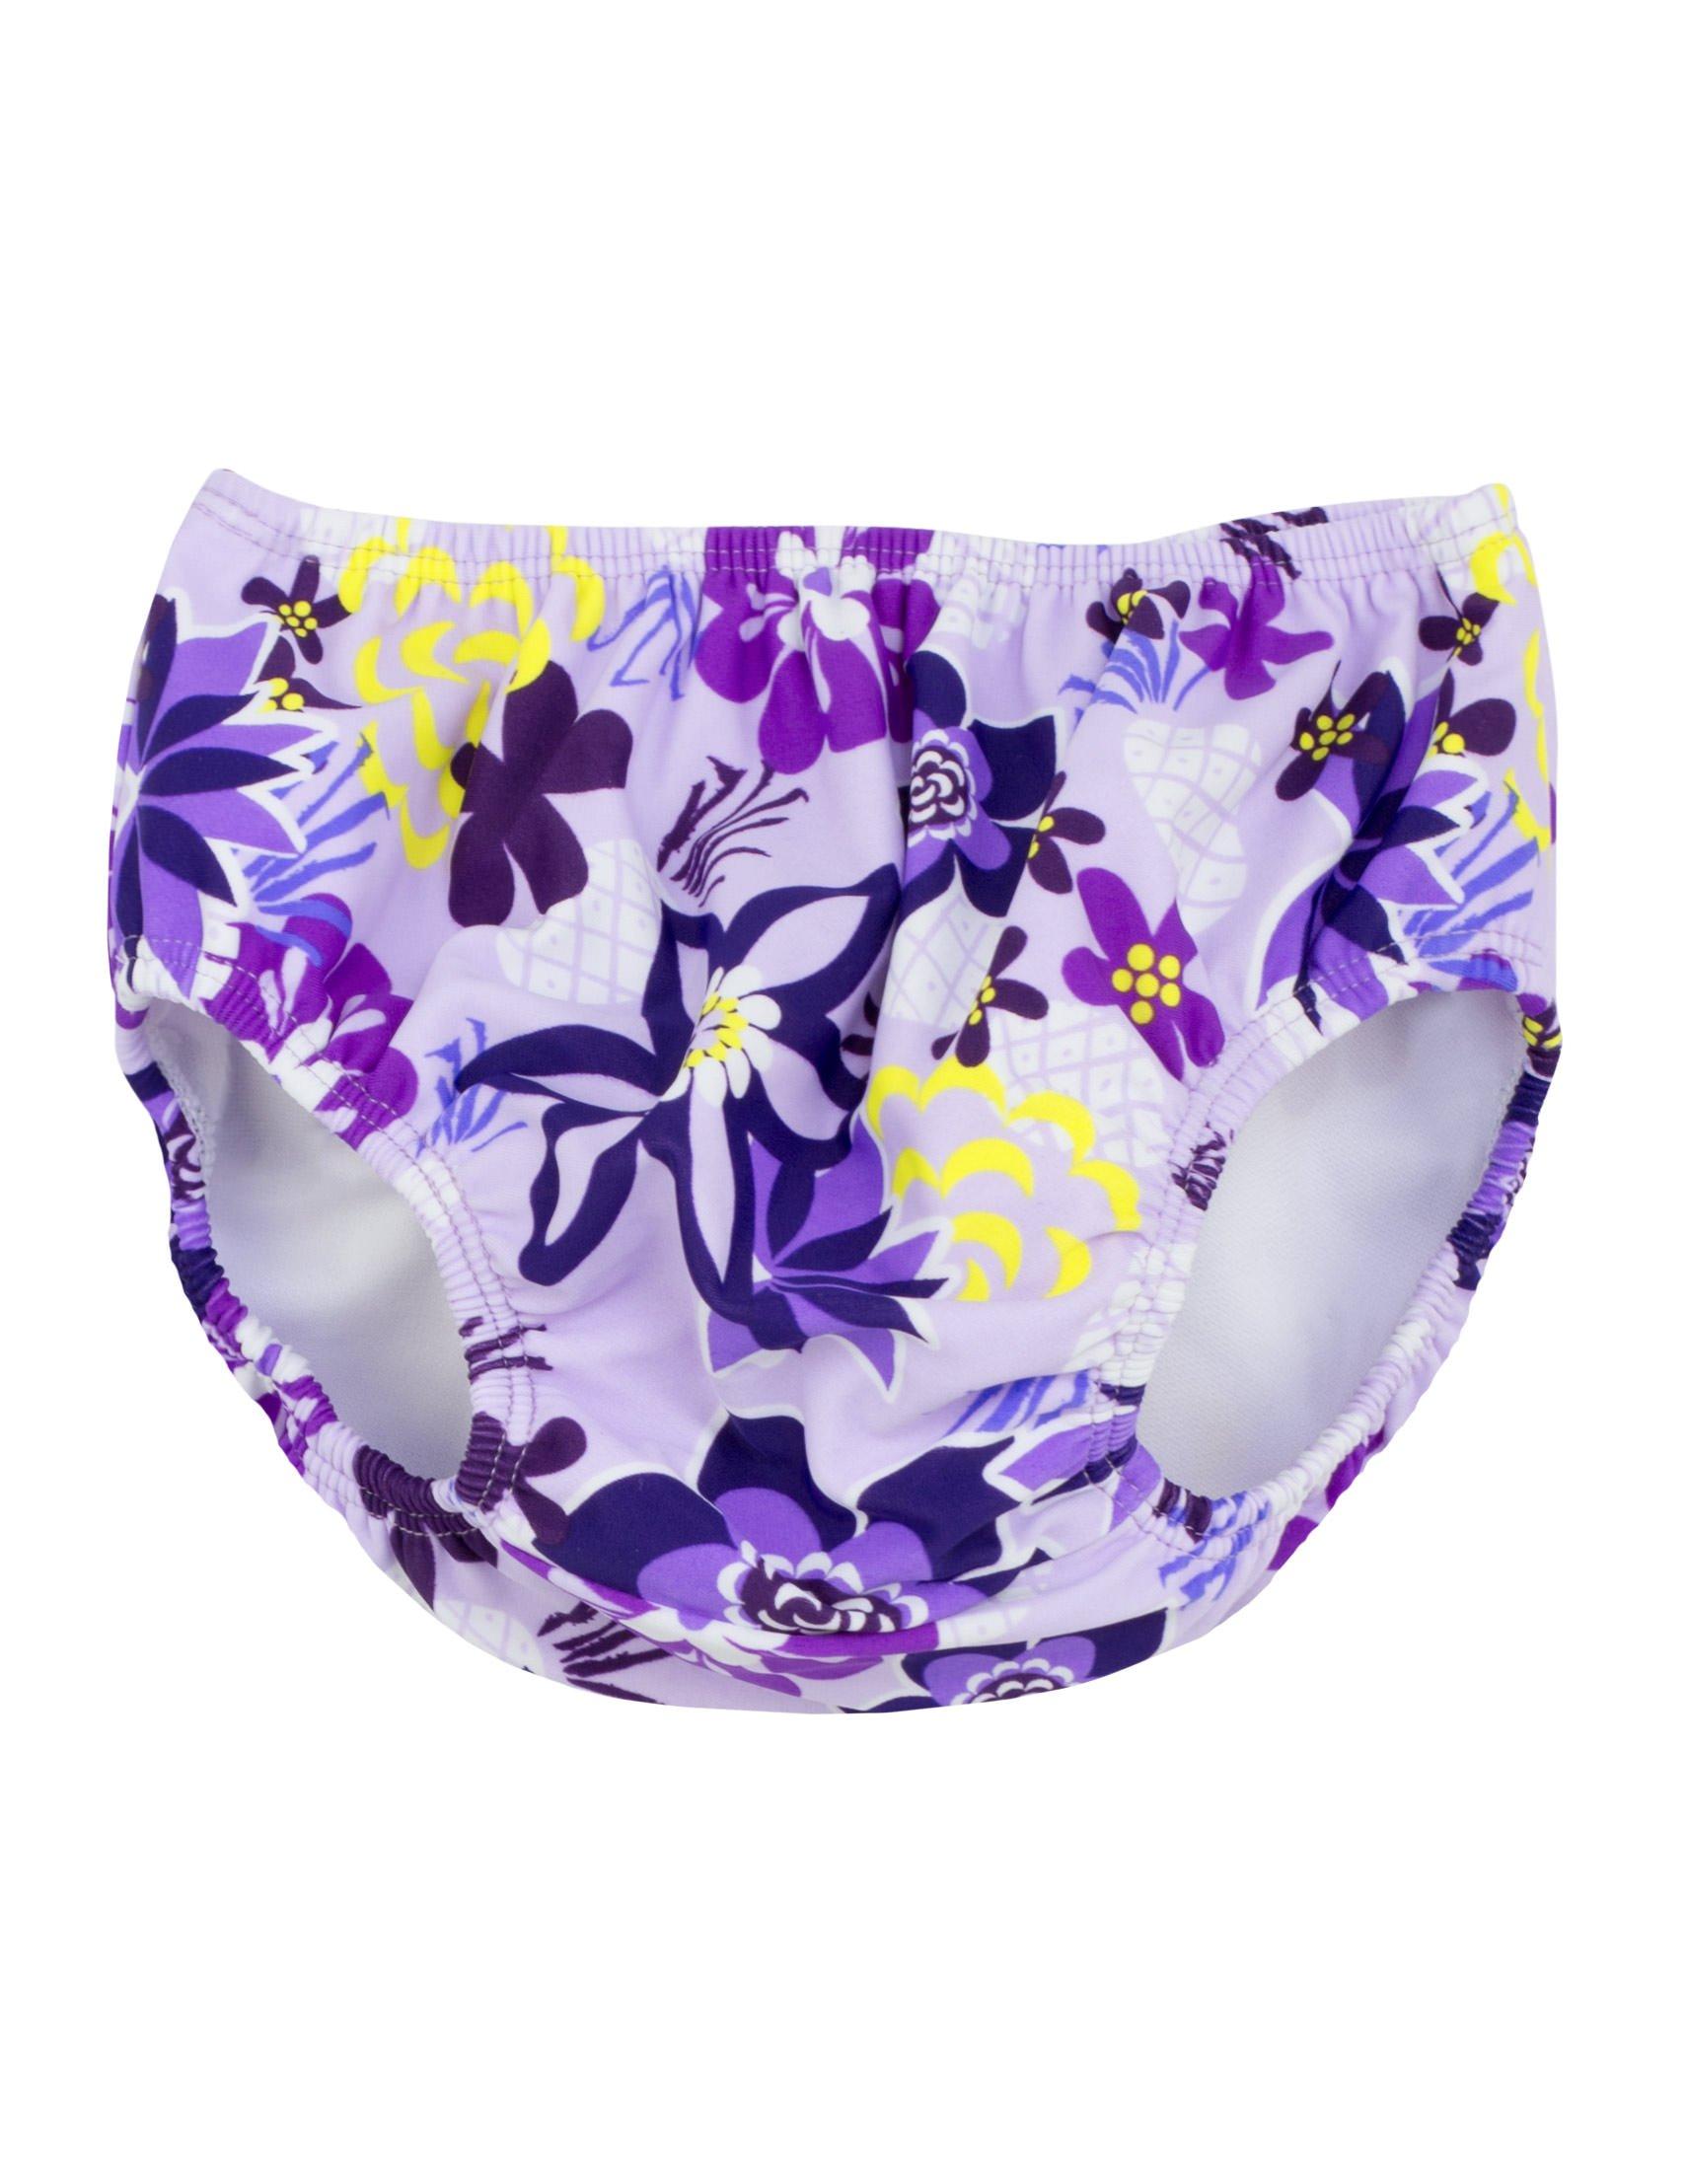 Tuga Girls Reusable Swim Diaper, Agata, 2XL